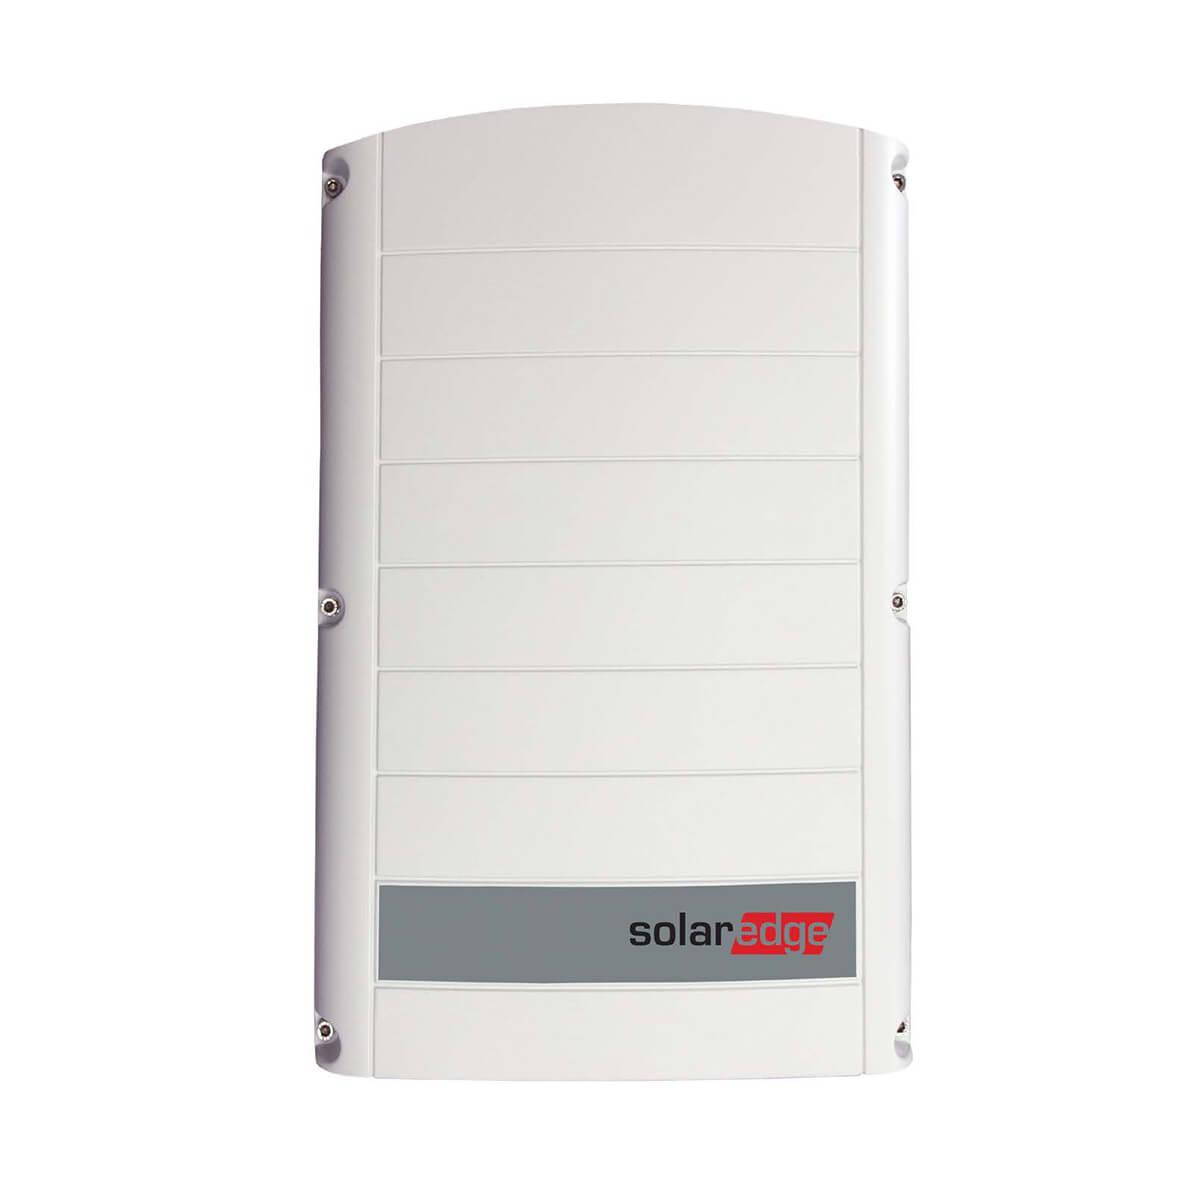 solaredge 10kW inverter, solaredge se10k 10kW inverter, solaredge se10k inverter, solaredge se10k, solaredge 10 kW